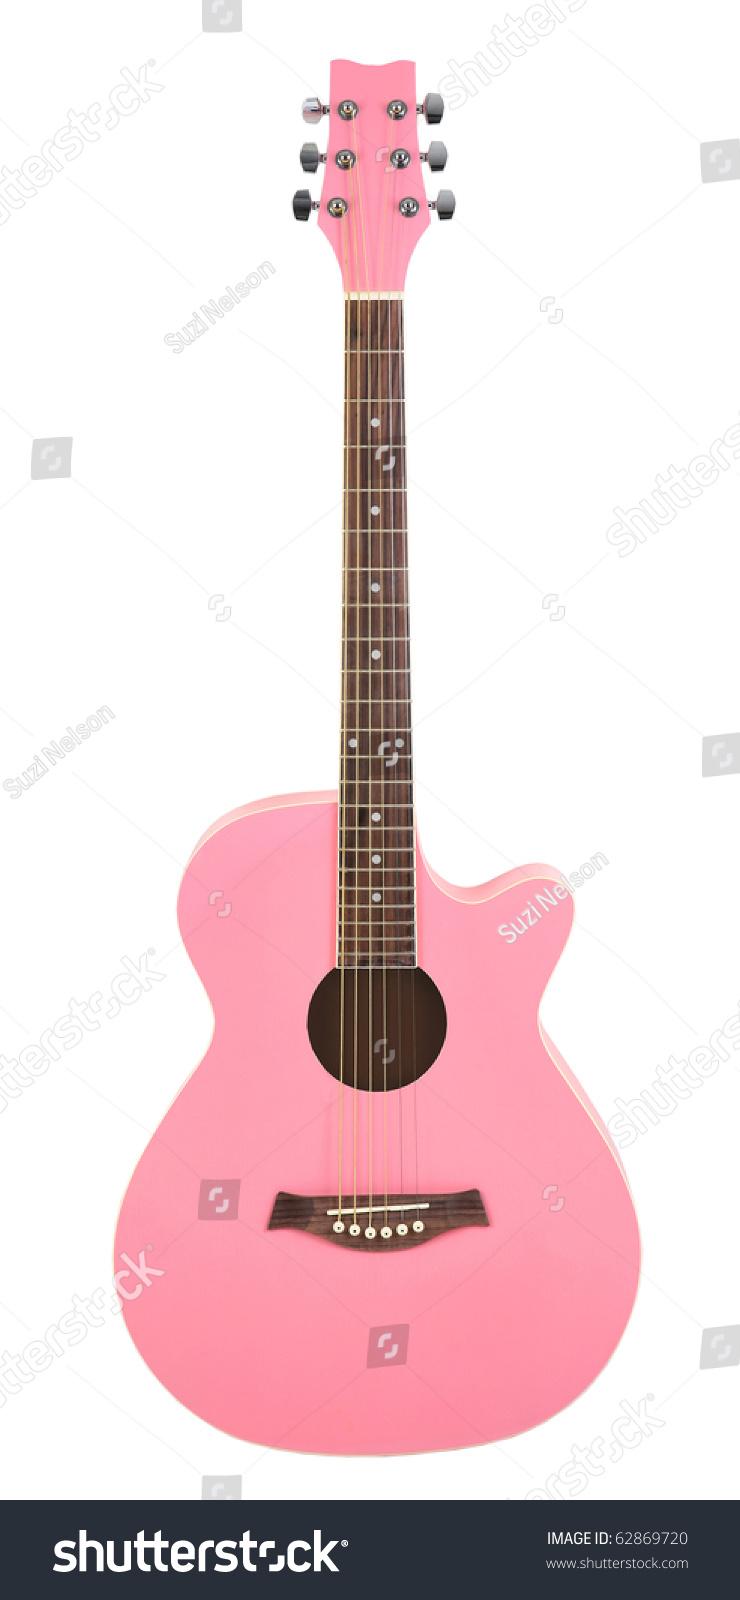 Pastel Pink Acoustic Cutaway Girlie Guitar Stock Photo Edit Now 62869720